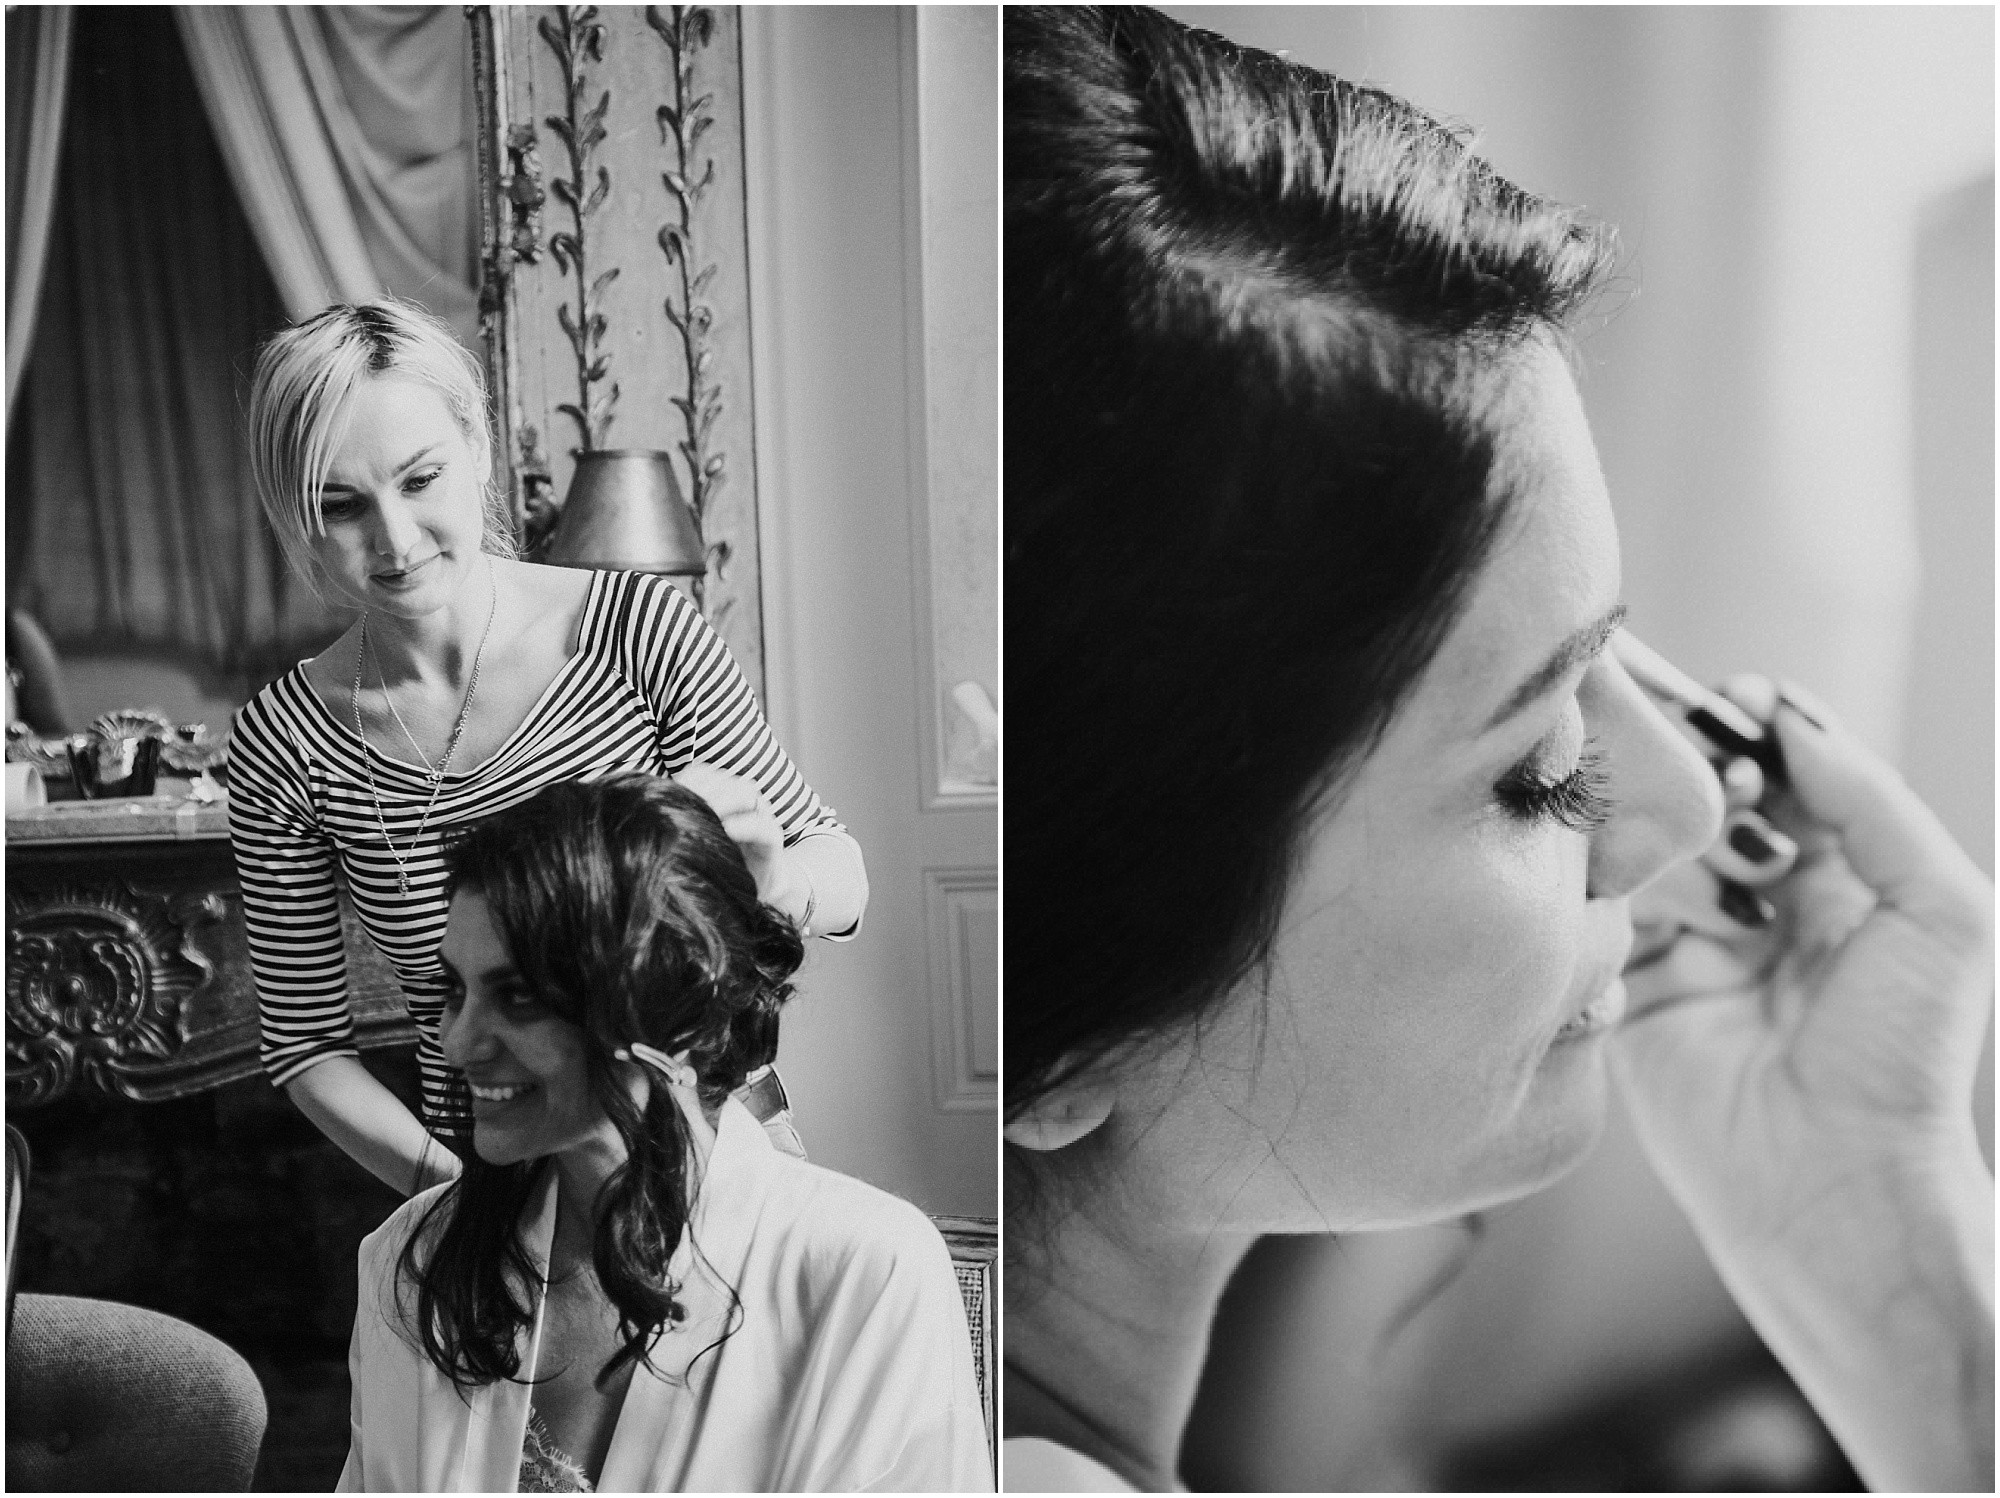 Kateryna-photos-photographer-mariage-chateau-saint-paterne-alencon-normandie-mayenne-le-mans_0007.jpg